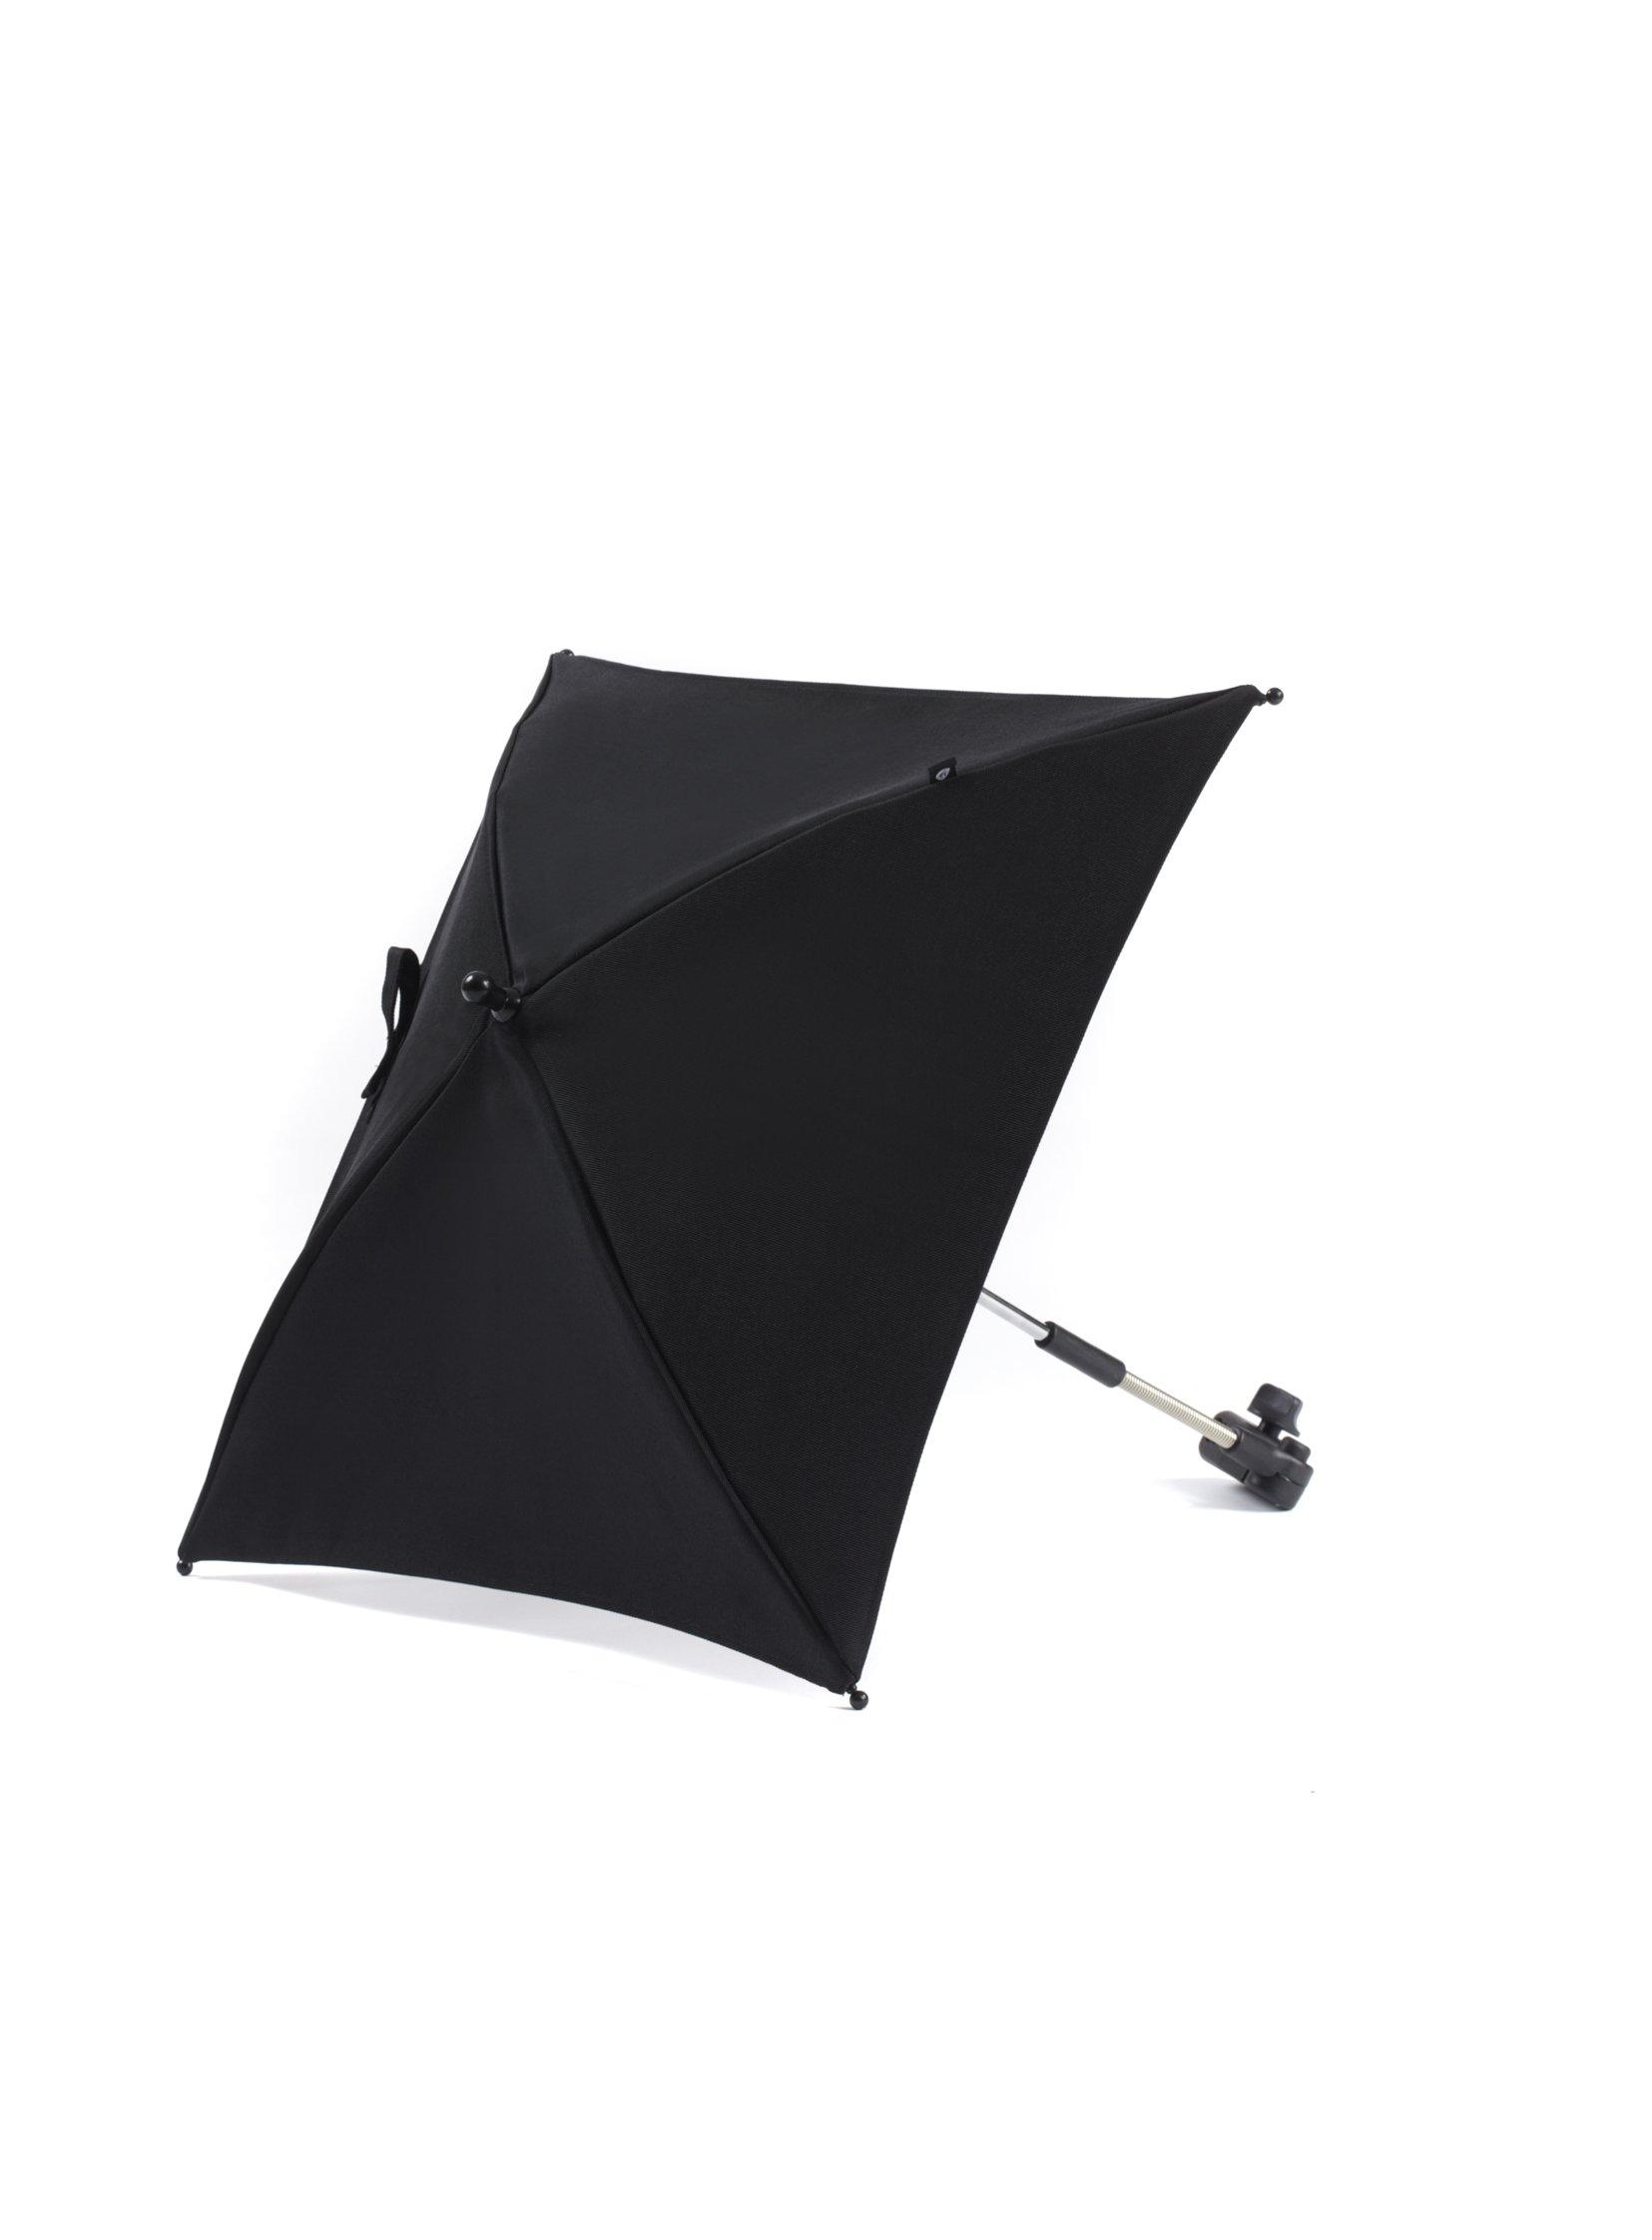 Mutsy Evo Stroller Umbrella, Black